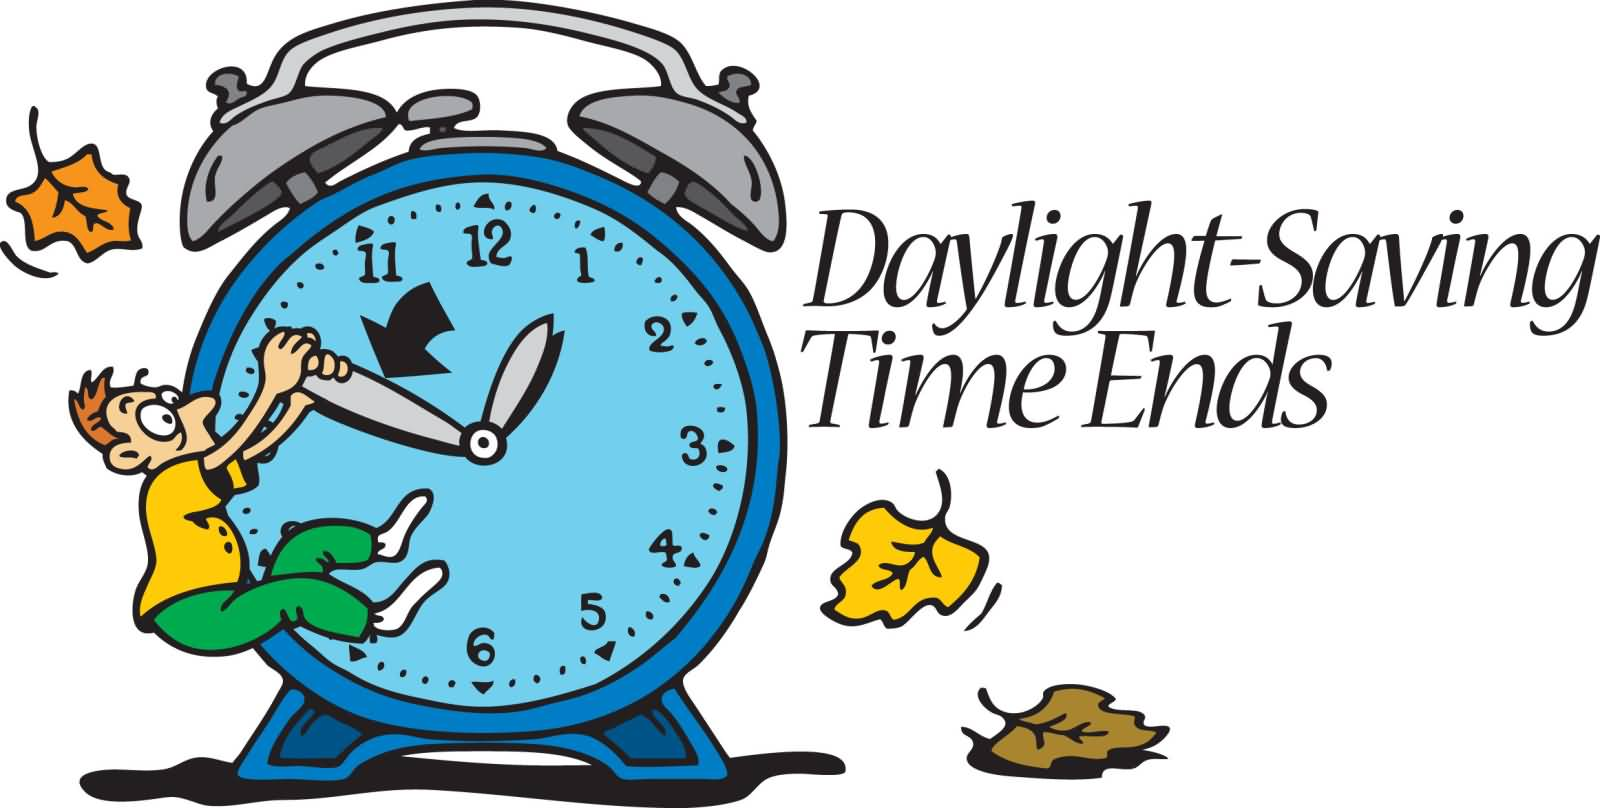 Daylight Saving Time Ends Illustration-Daylight Saving Time Ends Illustration-10